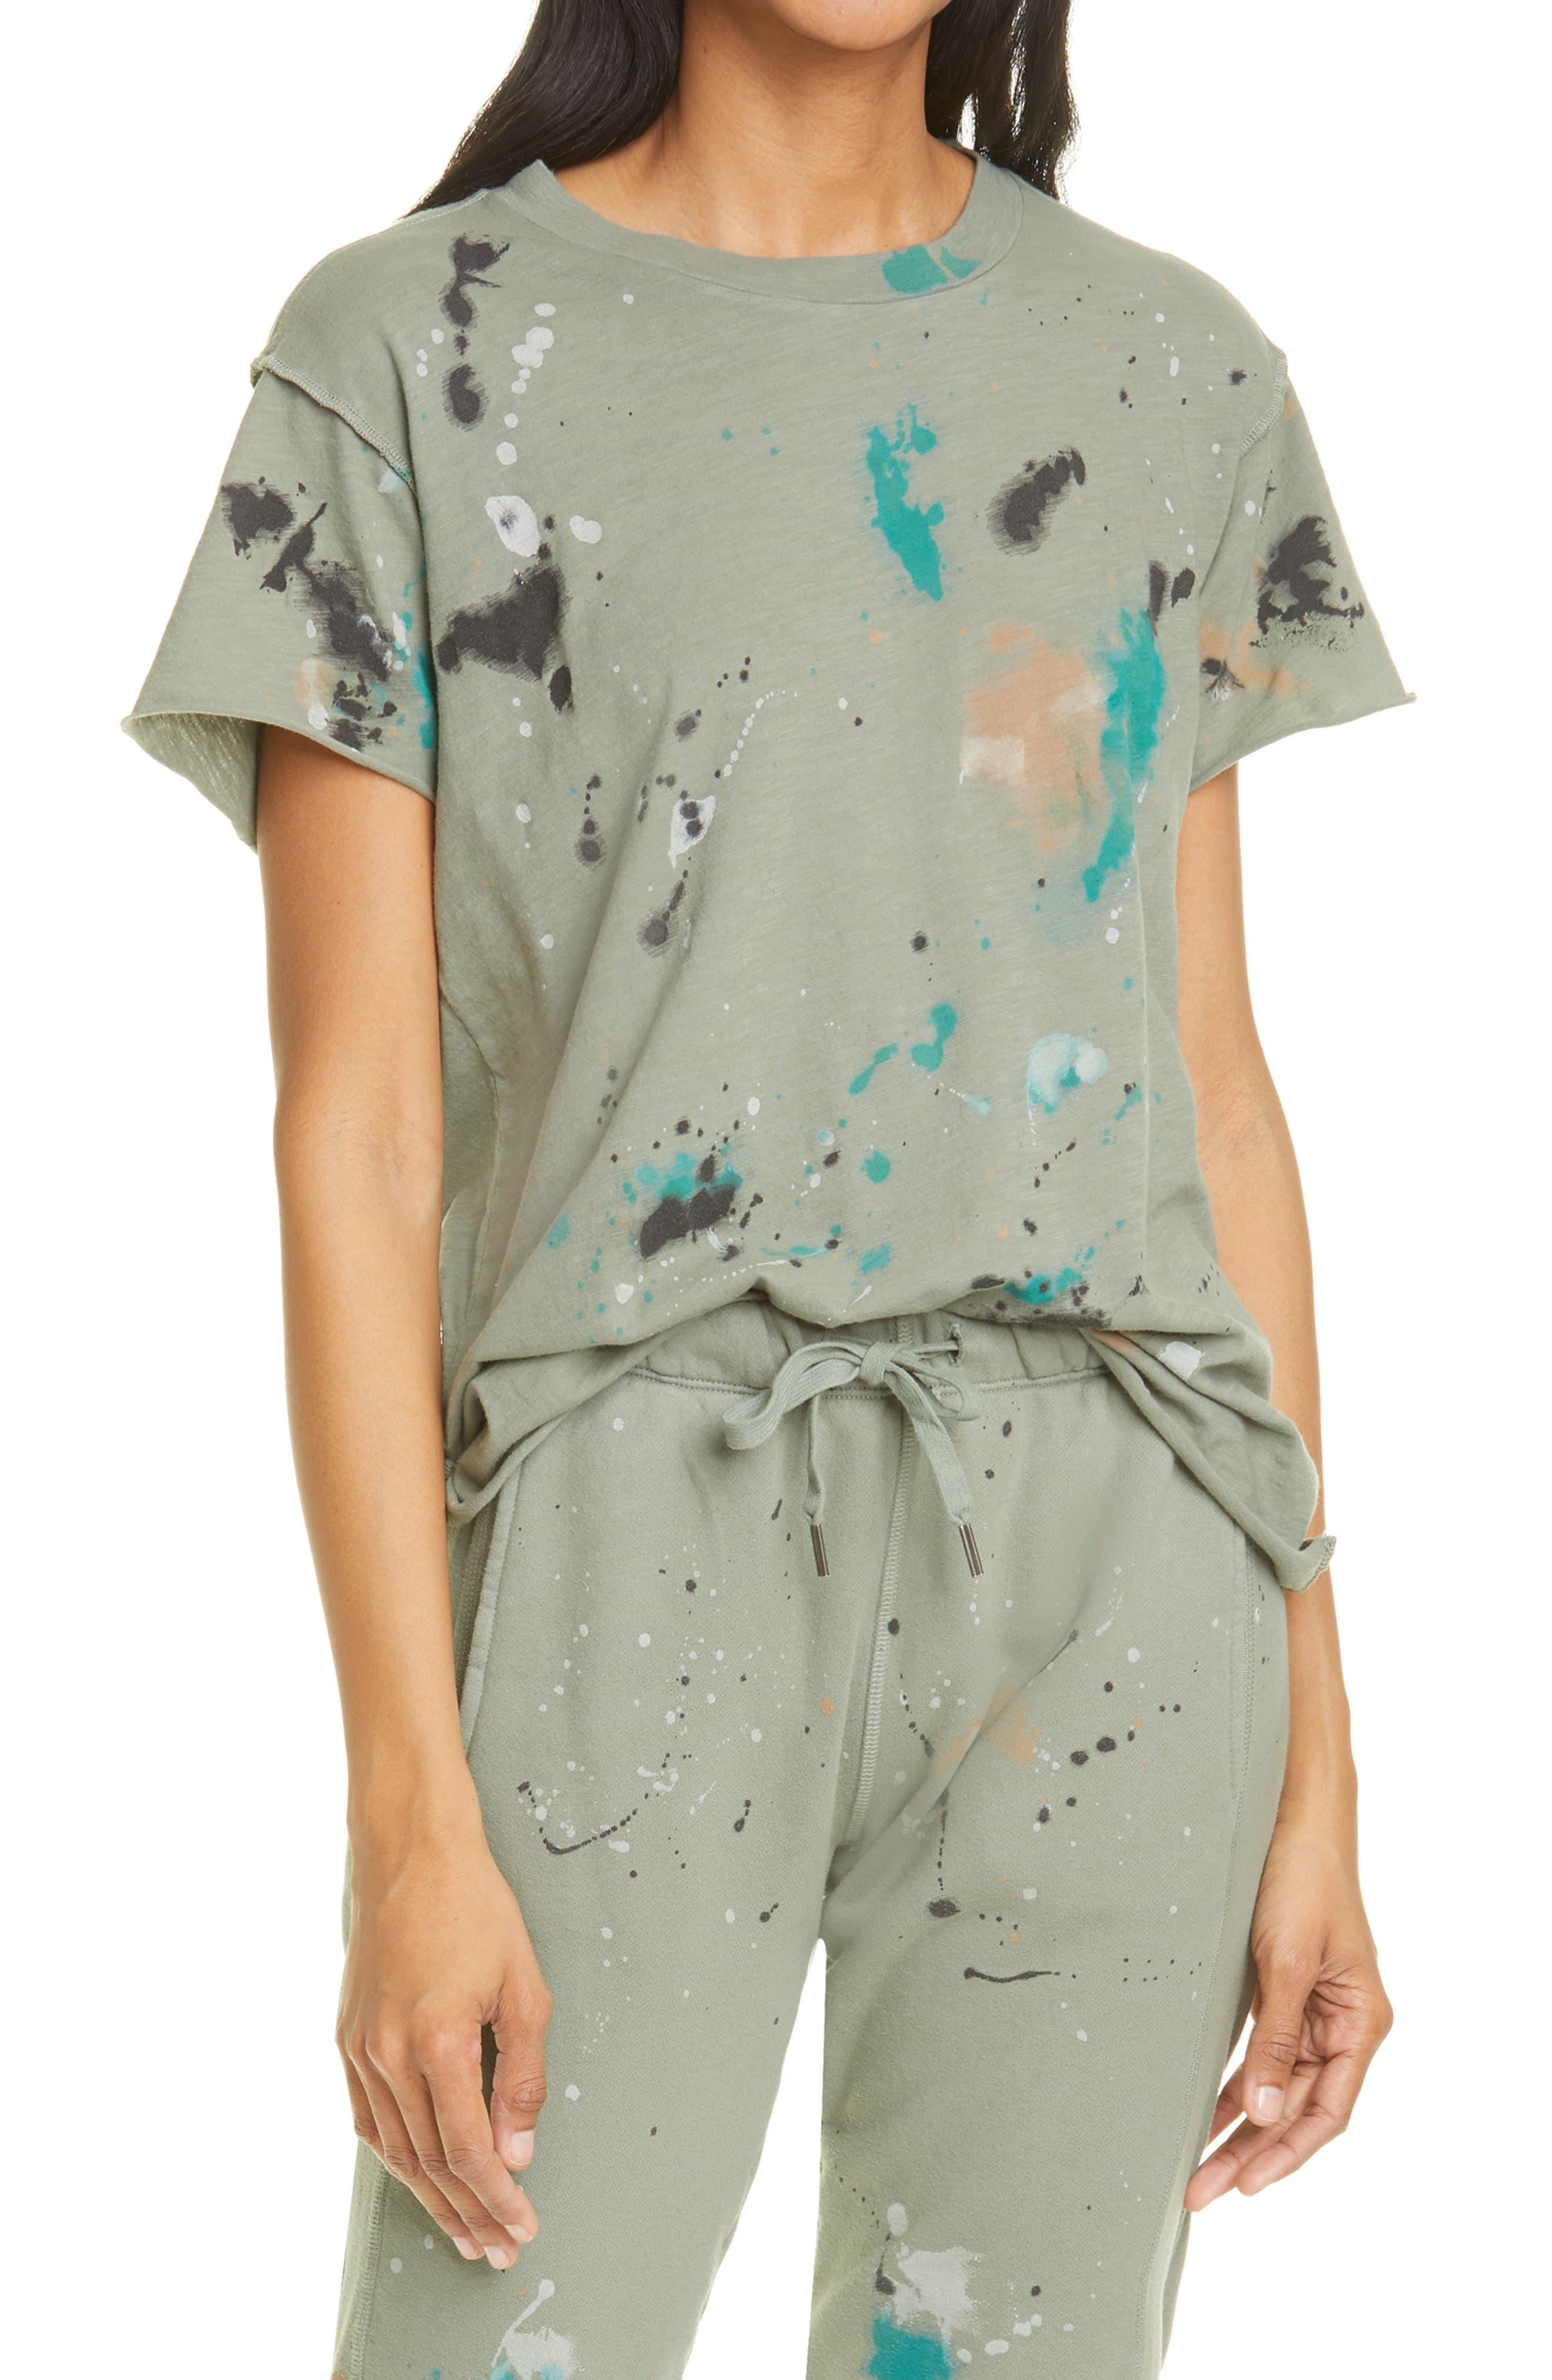 NSF Clothing Women's Nsf Clothing Moore Paint Splatter Boyfriend T-Shirt, Size Medium - Green